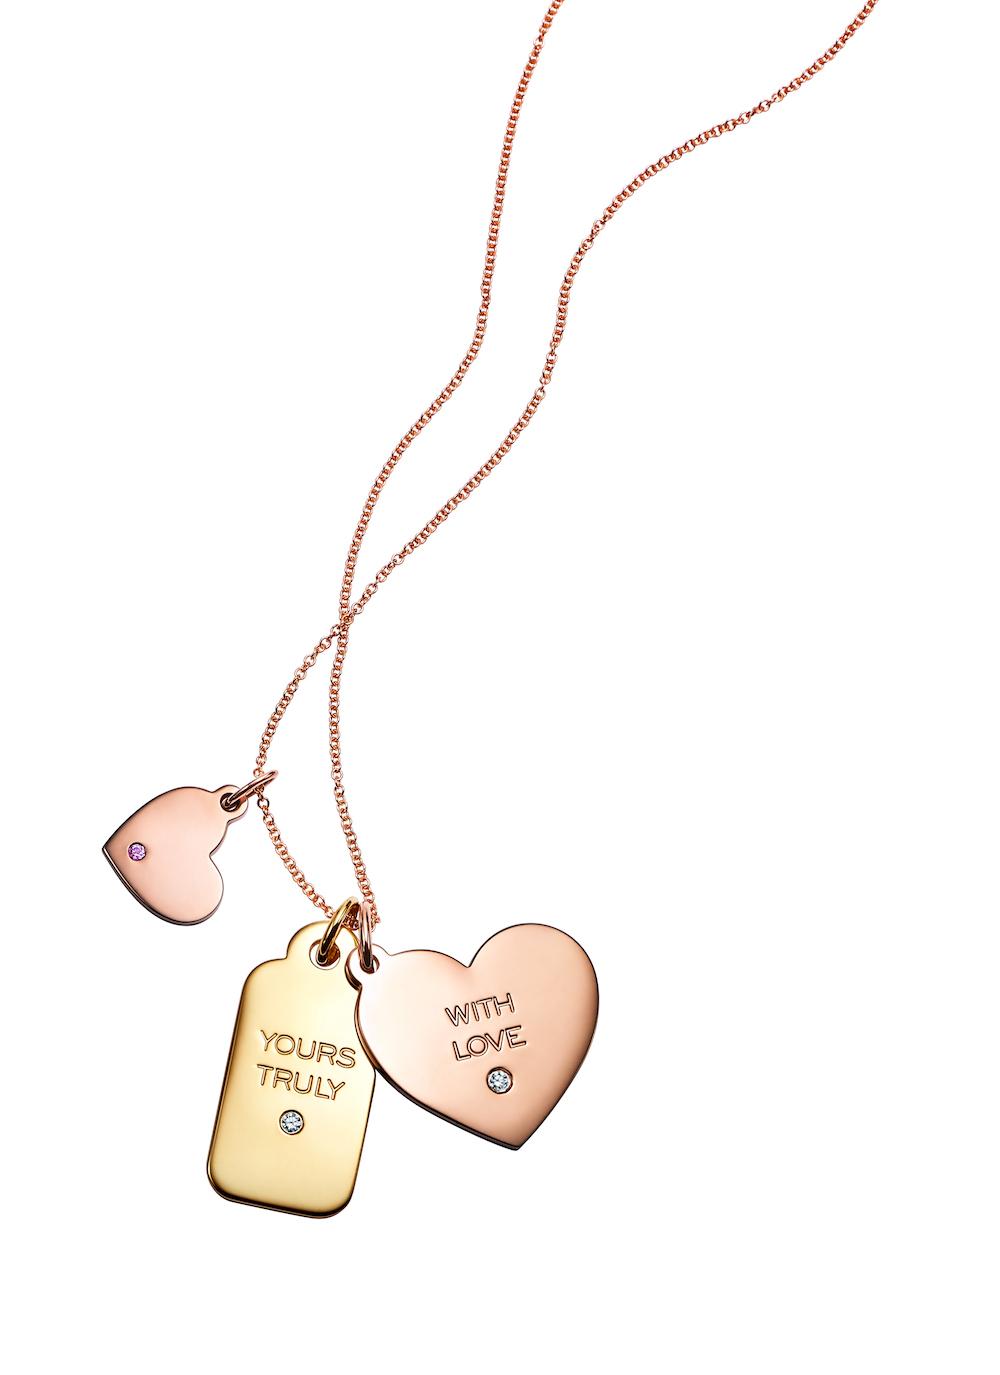 Tiffany & Co.Necklace